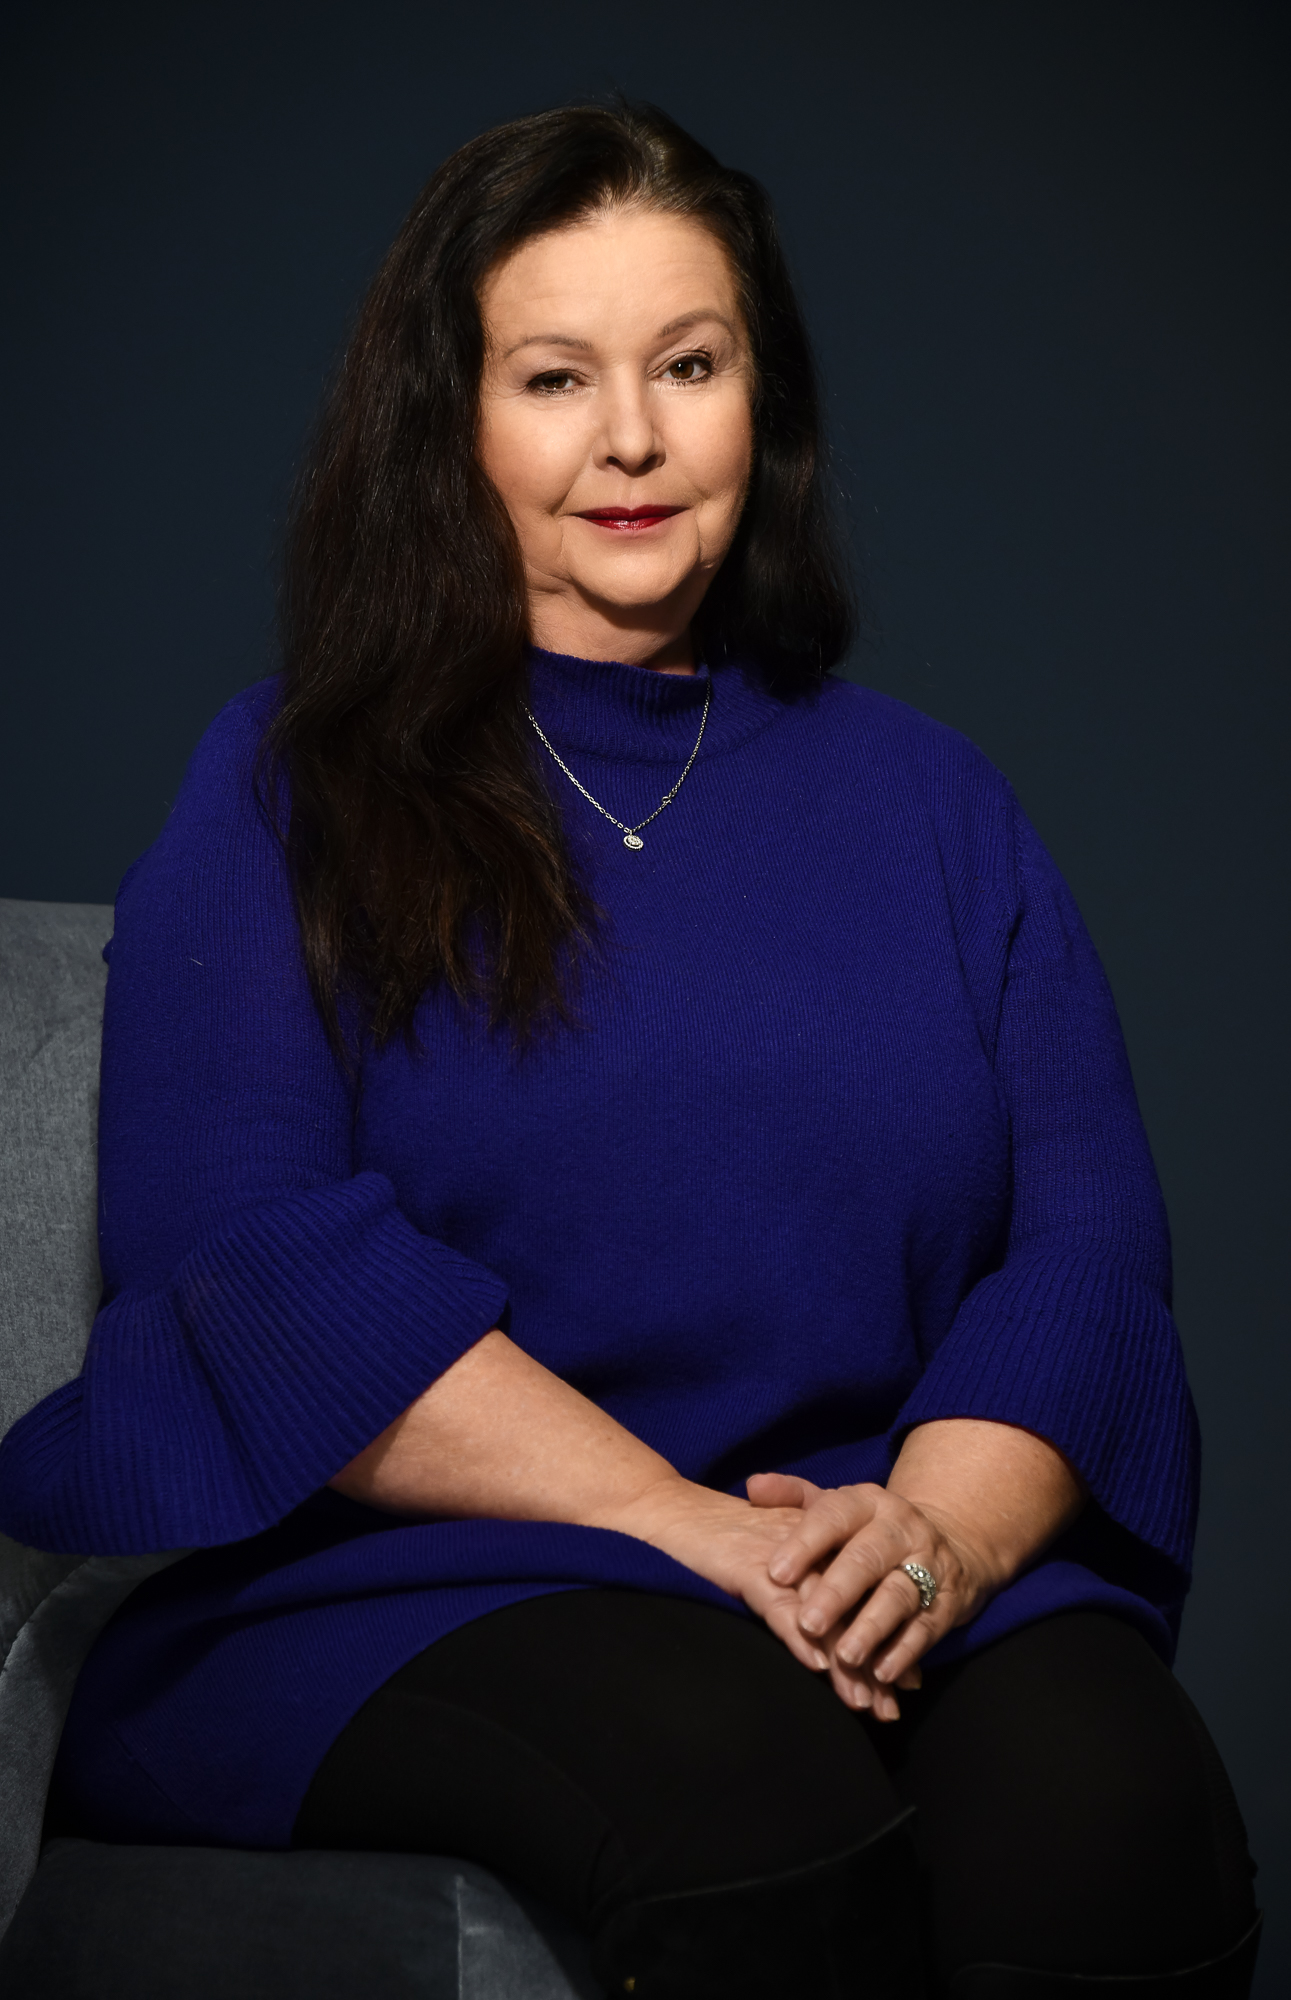 Jitka Zerhauová